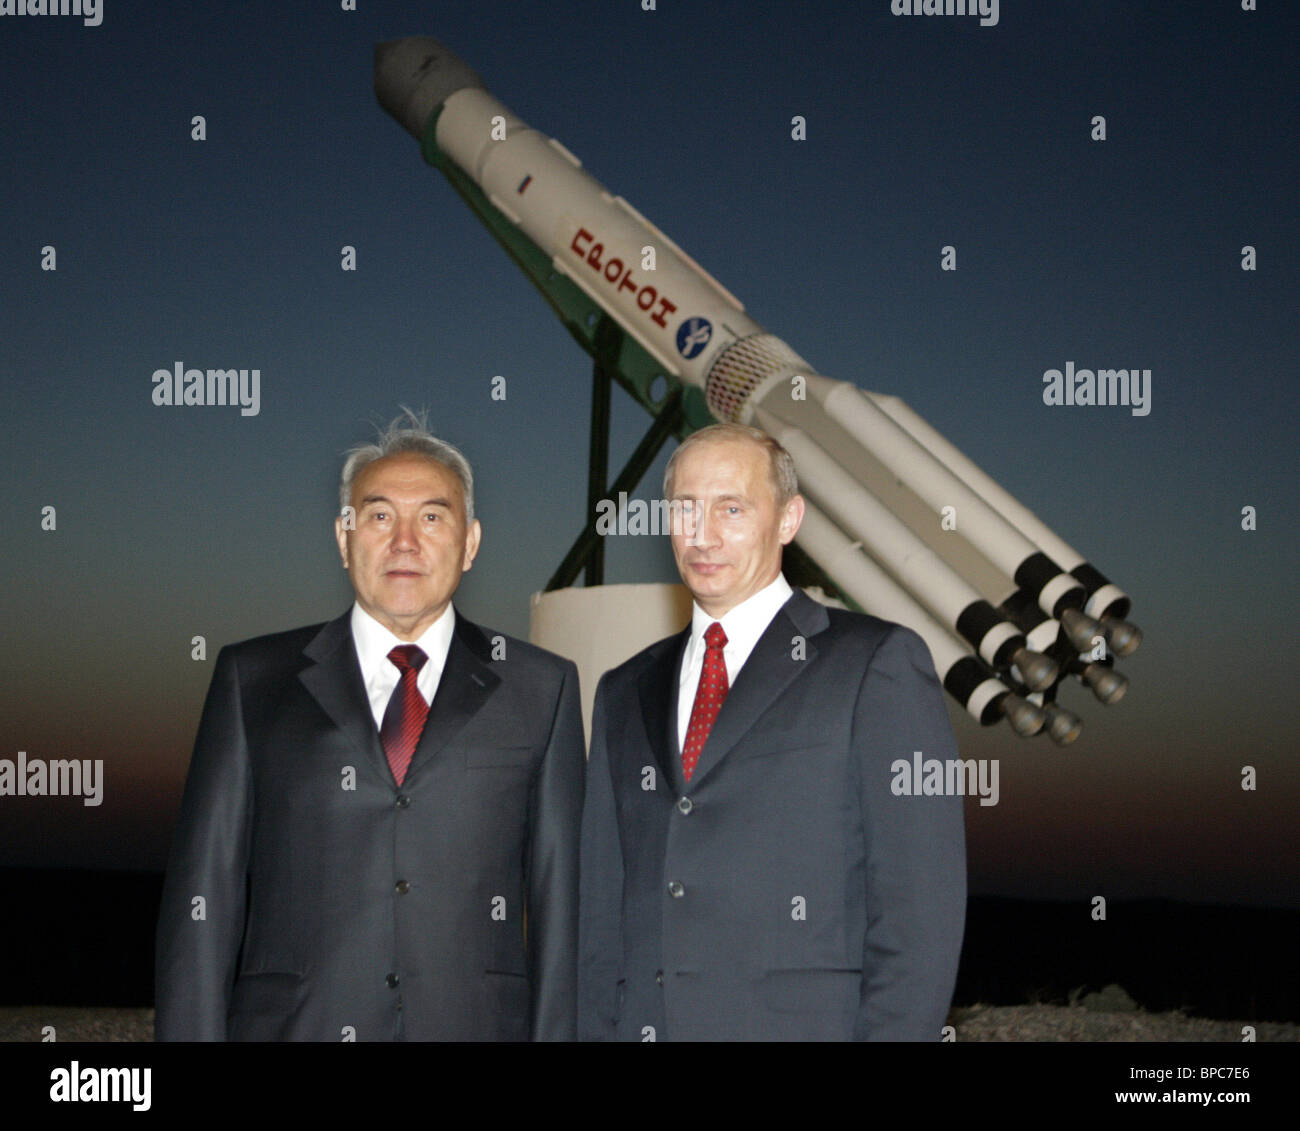 Russian President Vladimir Putin watches Proton K rocket blast off Baikonur Cosmodrome - Stock Image